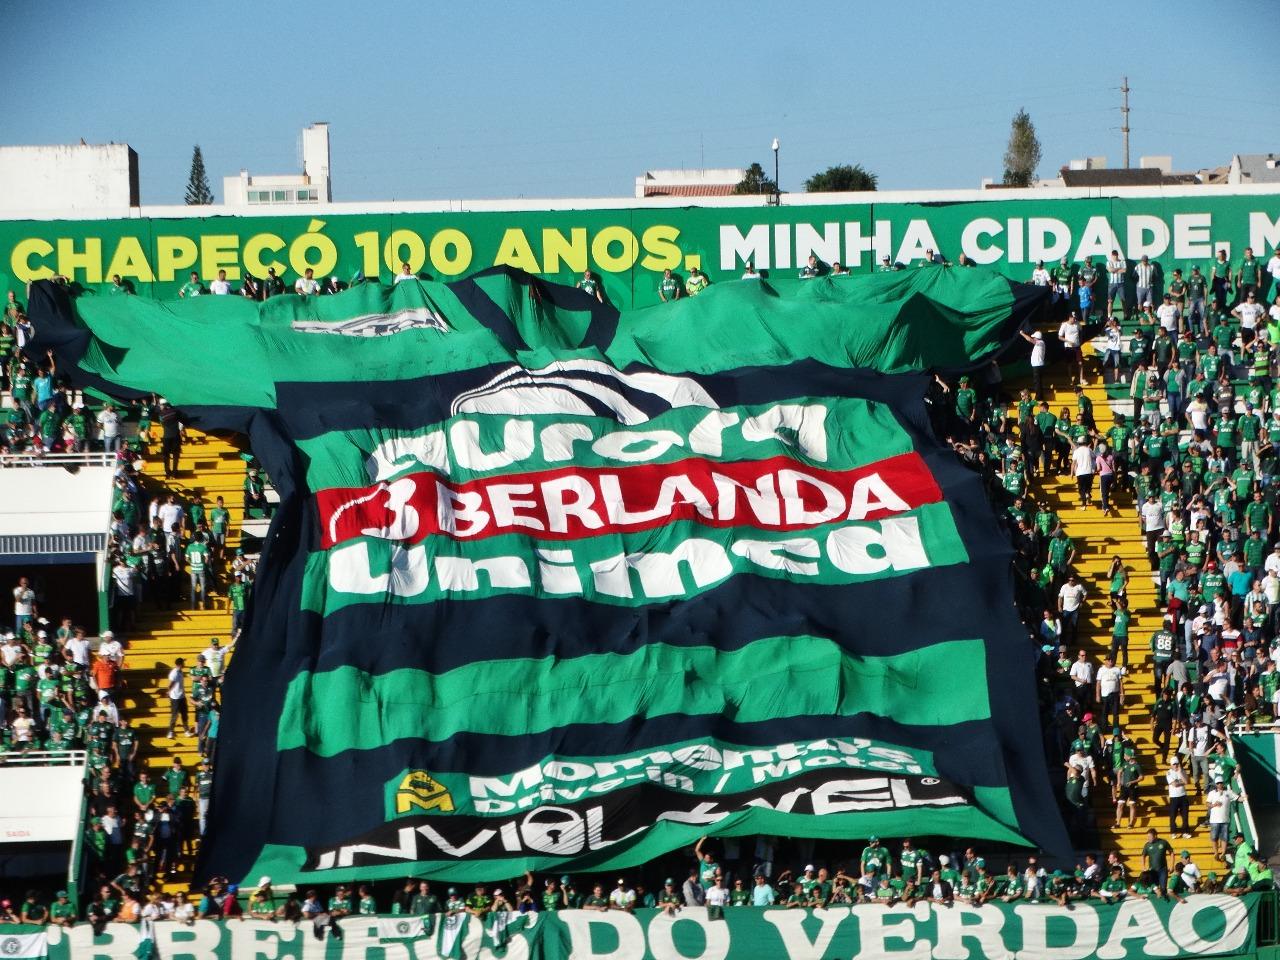 Chape vence a primeira no Brasileiro e tira a invencibilidade do Flamengo